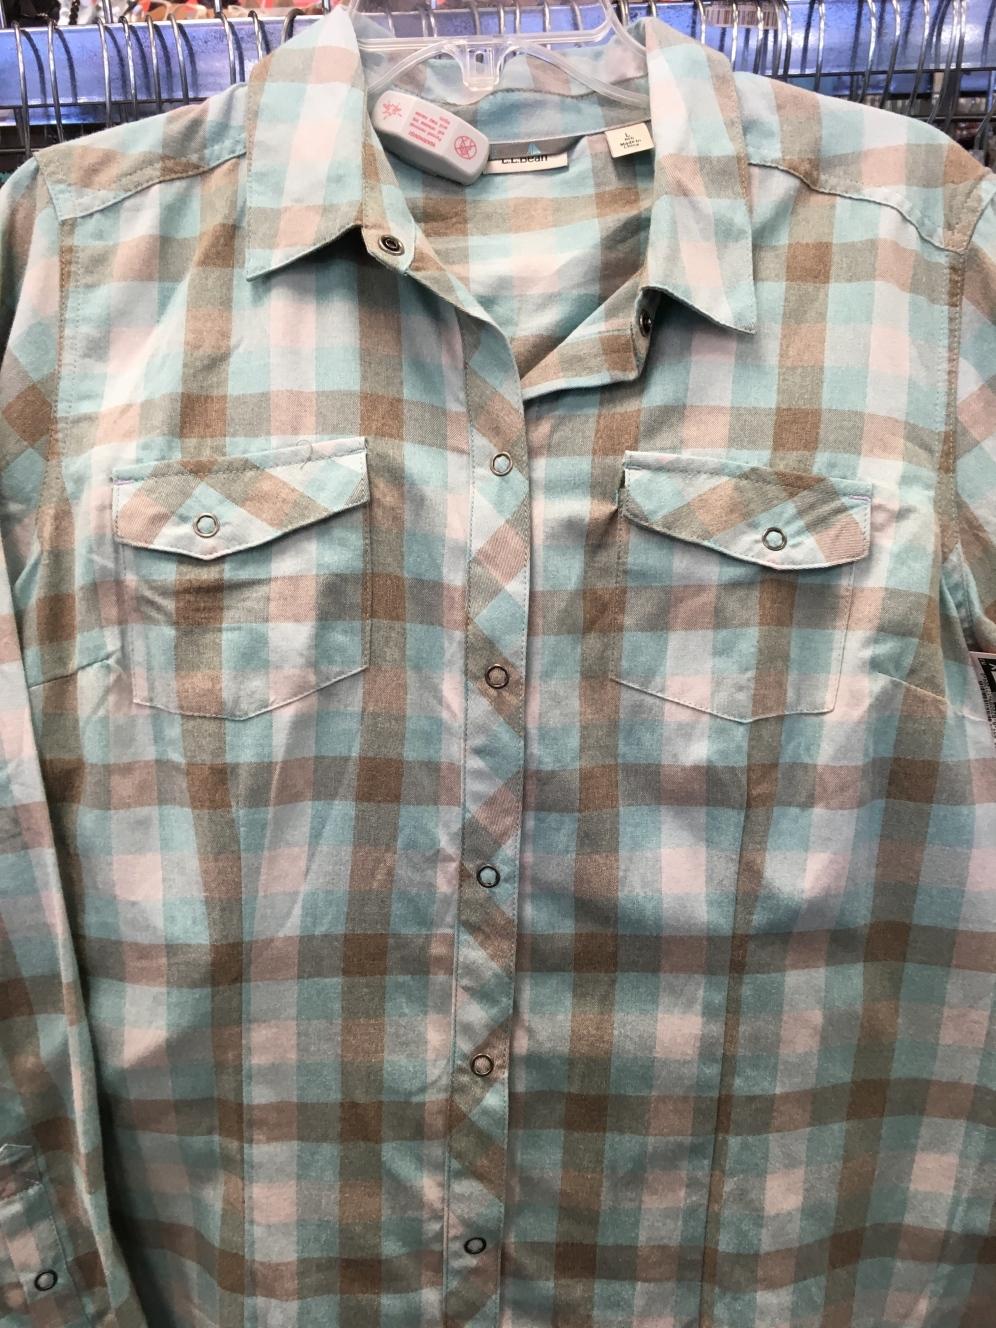 LL Bean snap button shirt found at a Plato's Closet.